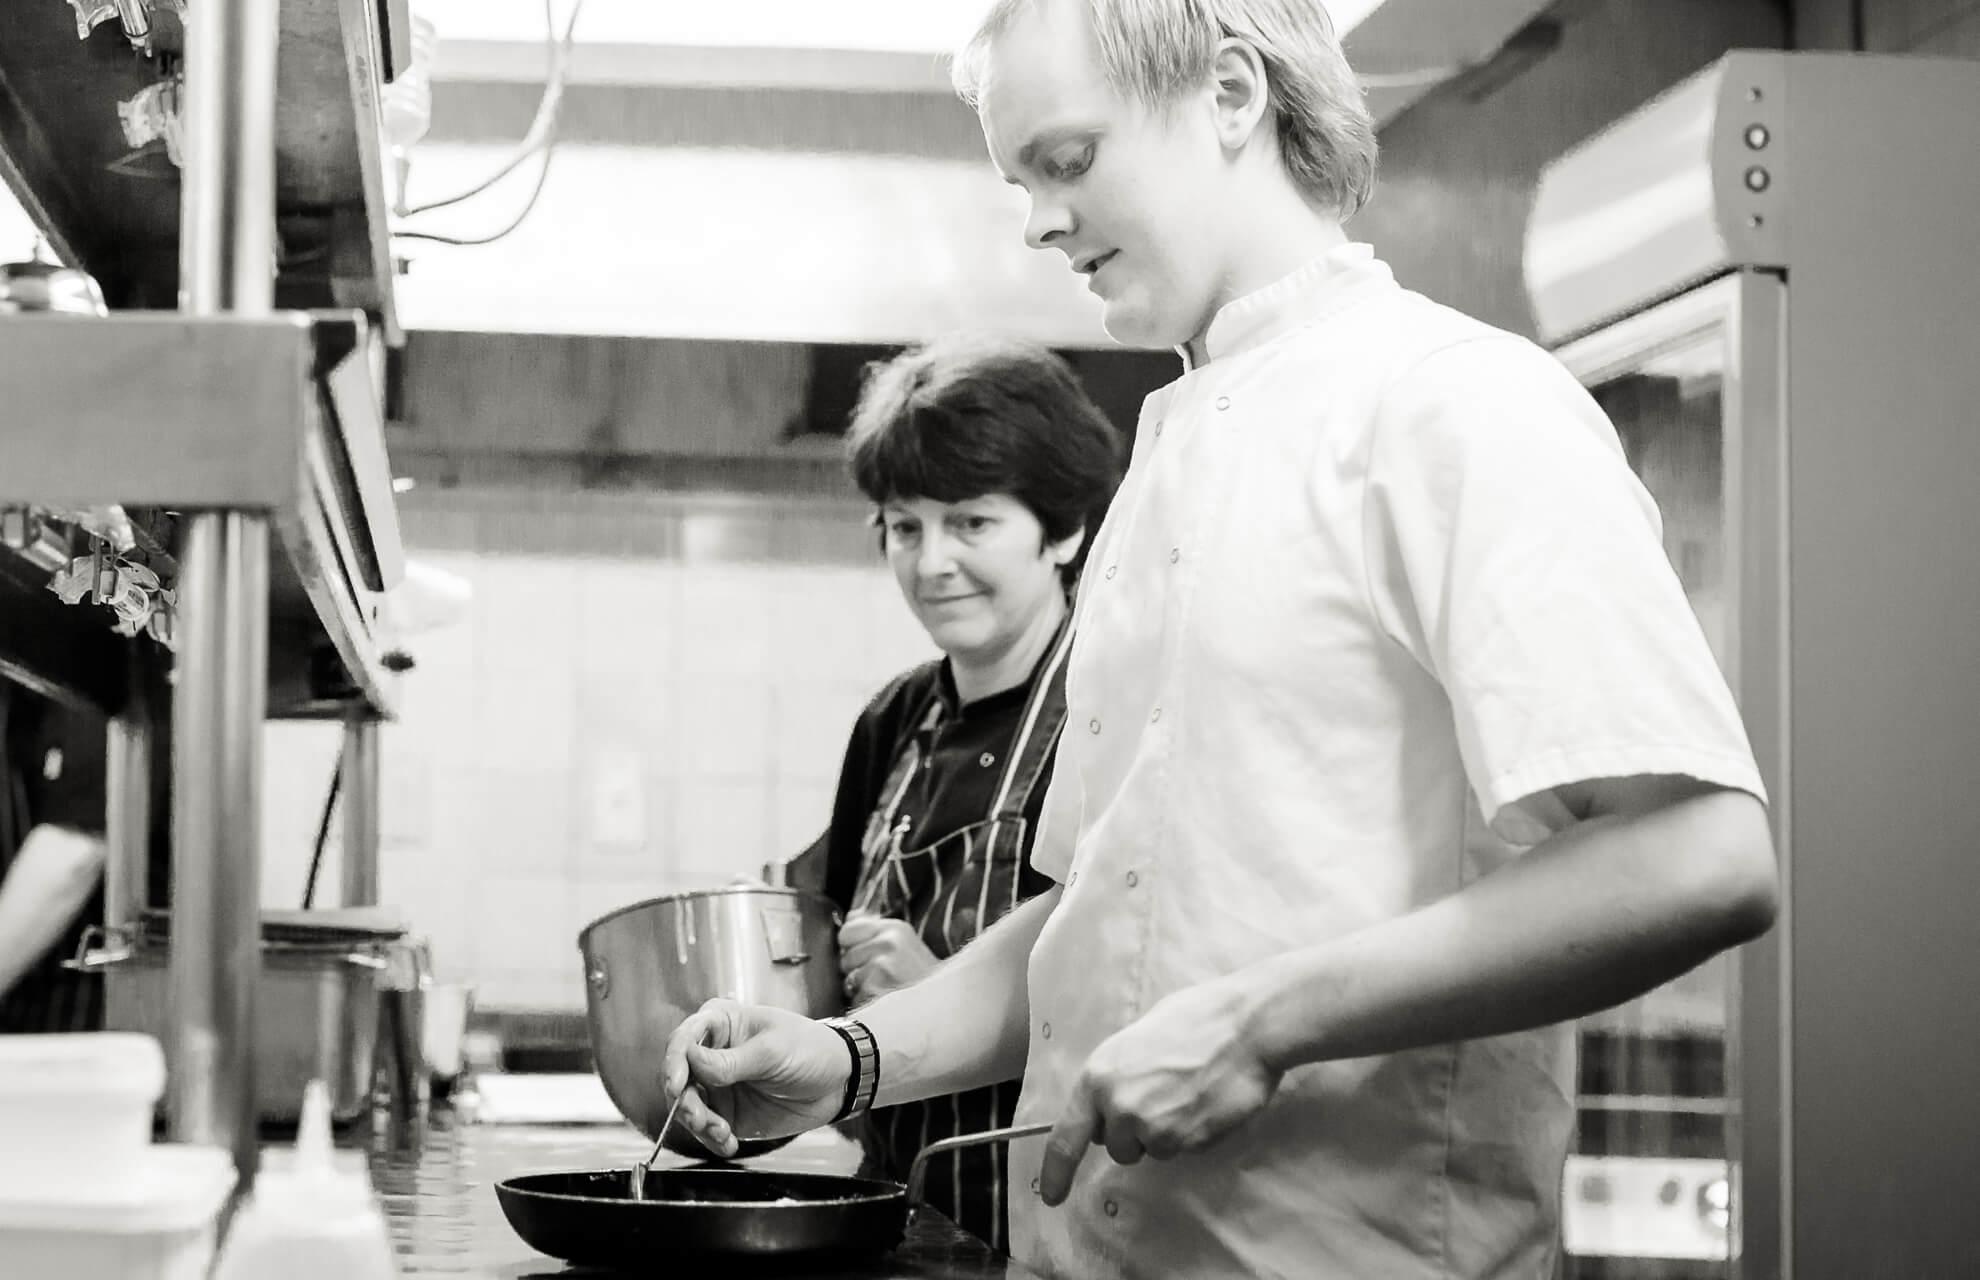 Godron-Stott-Chef-001